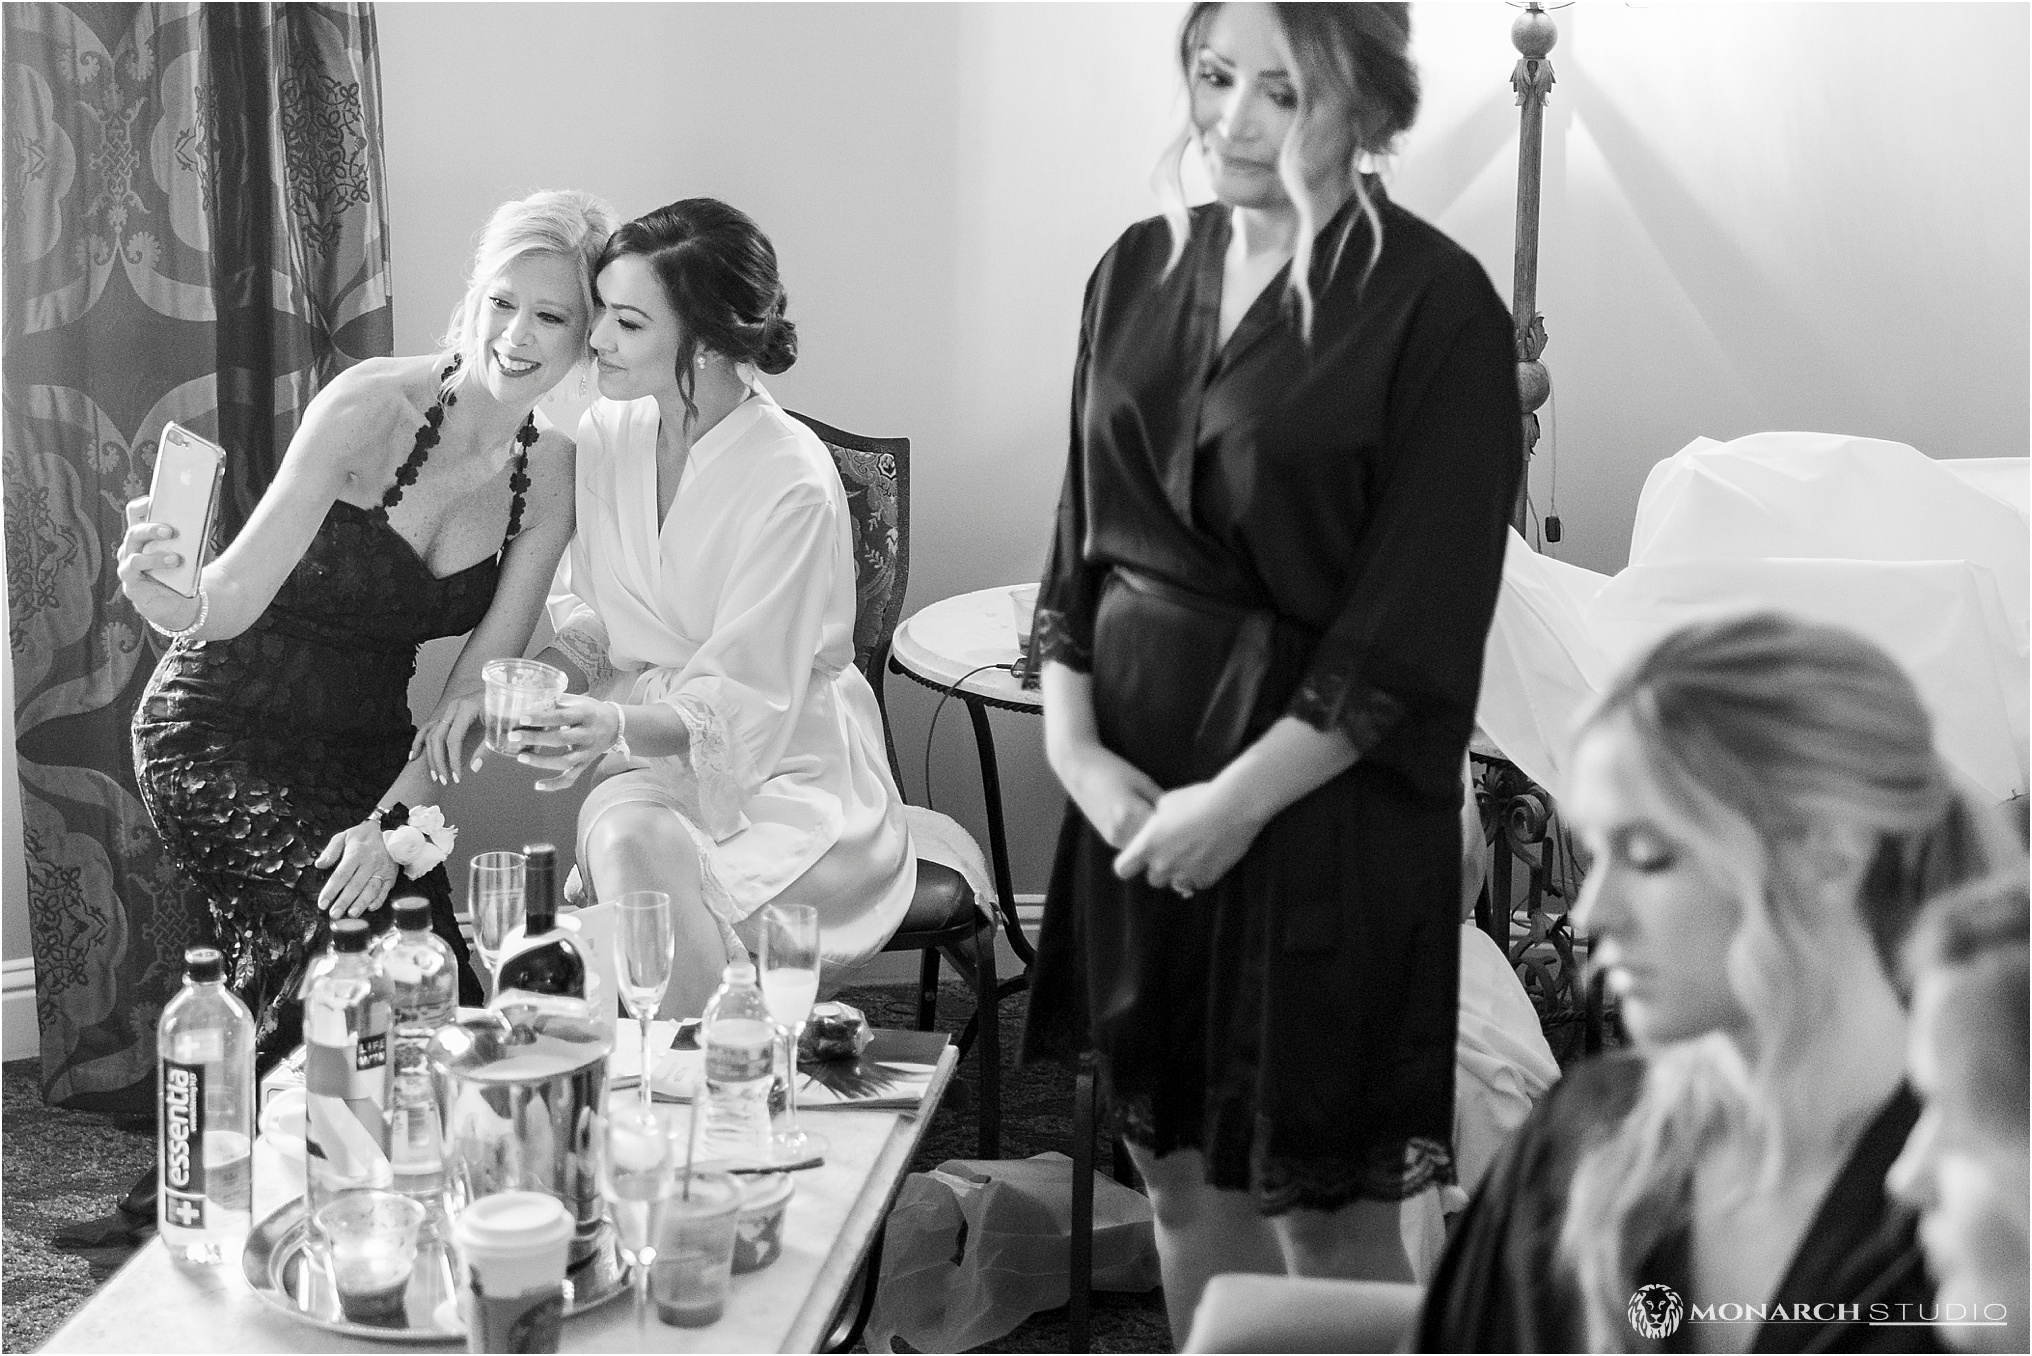 st-augustine-high-end-wedding-photographers-001.jpg